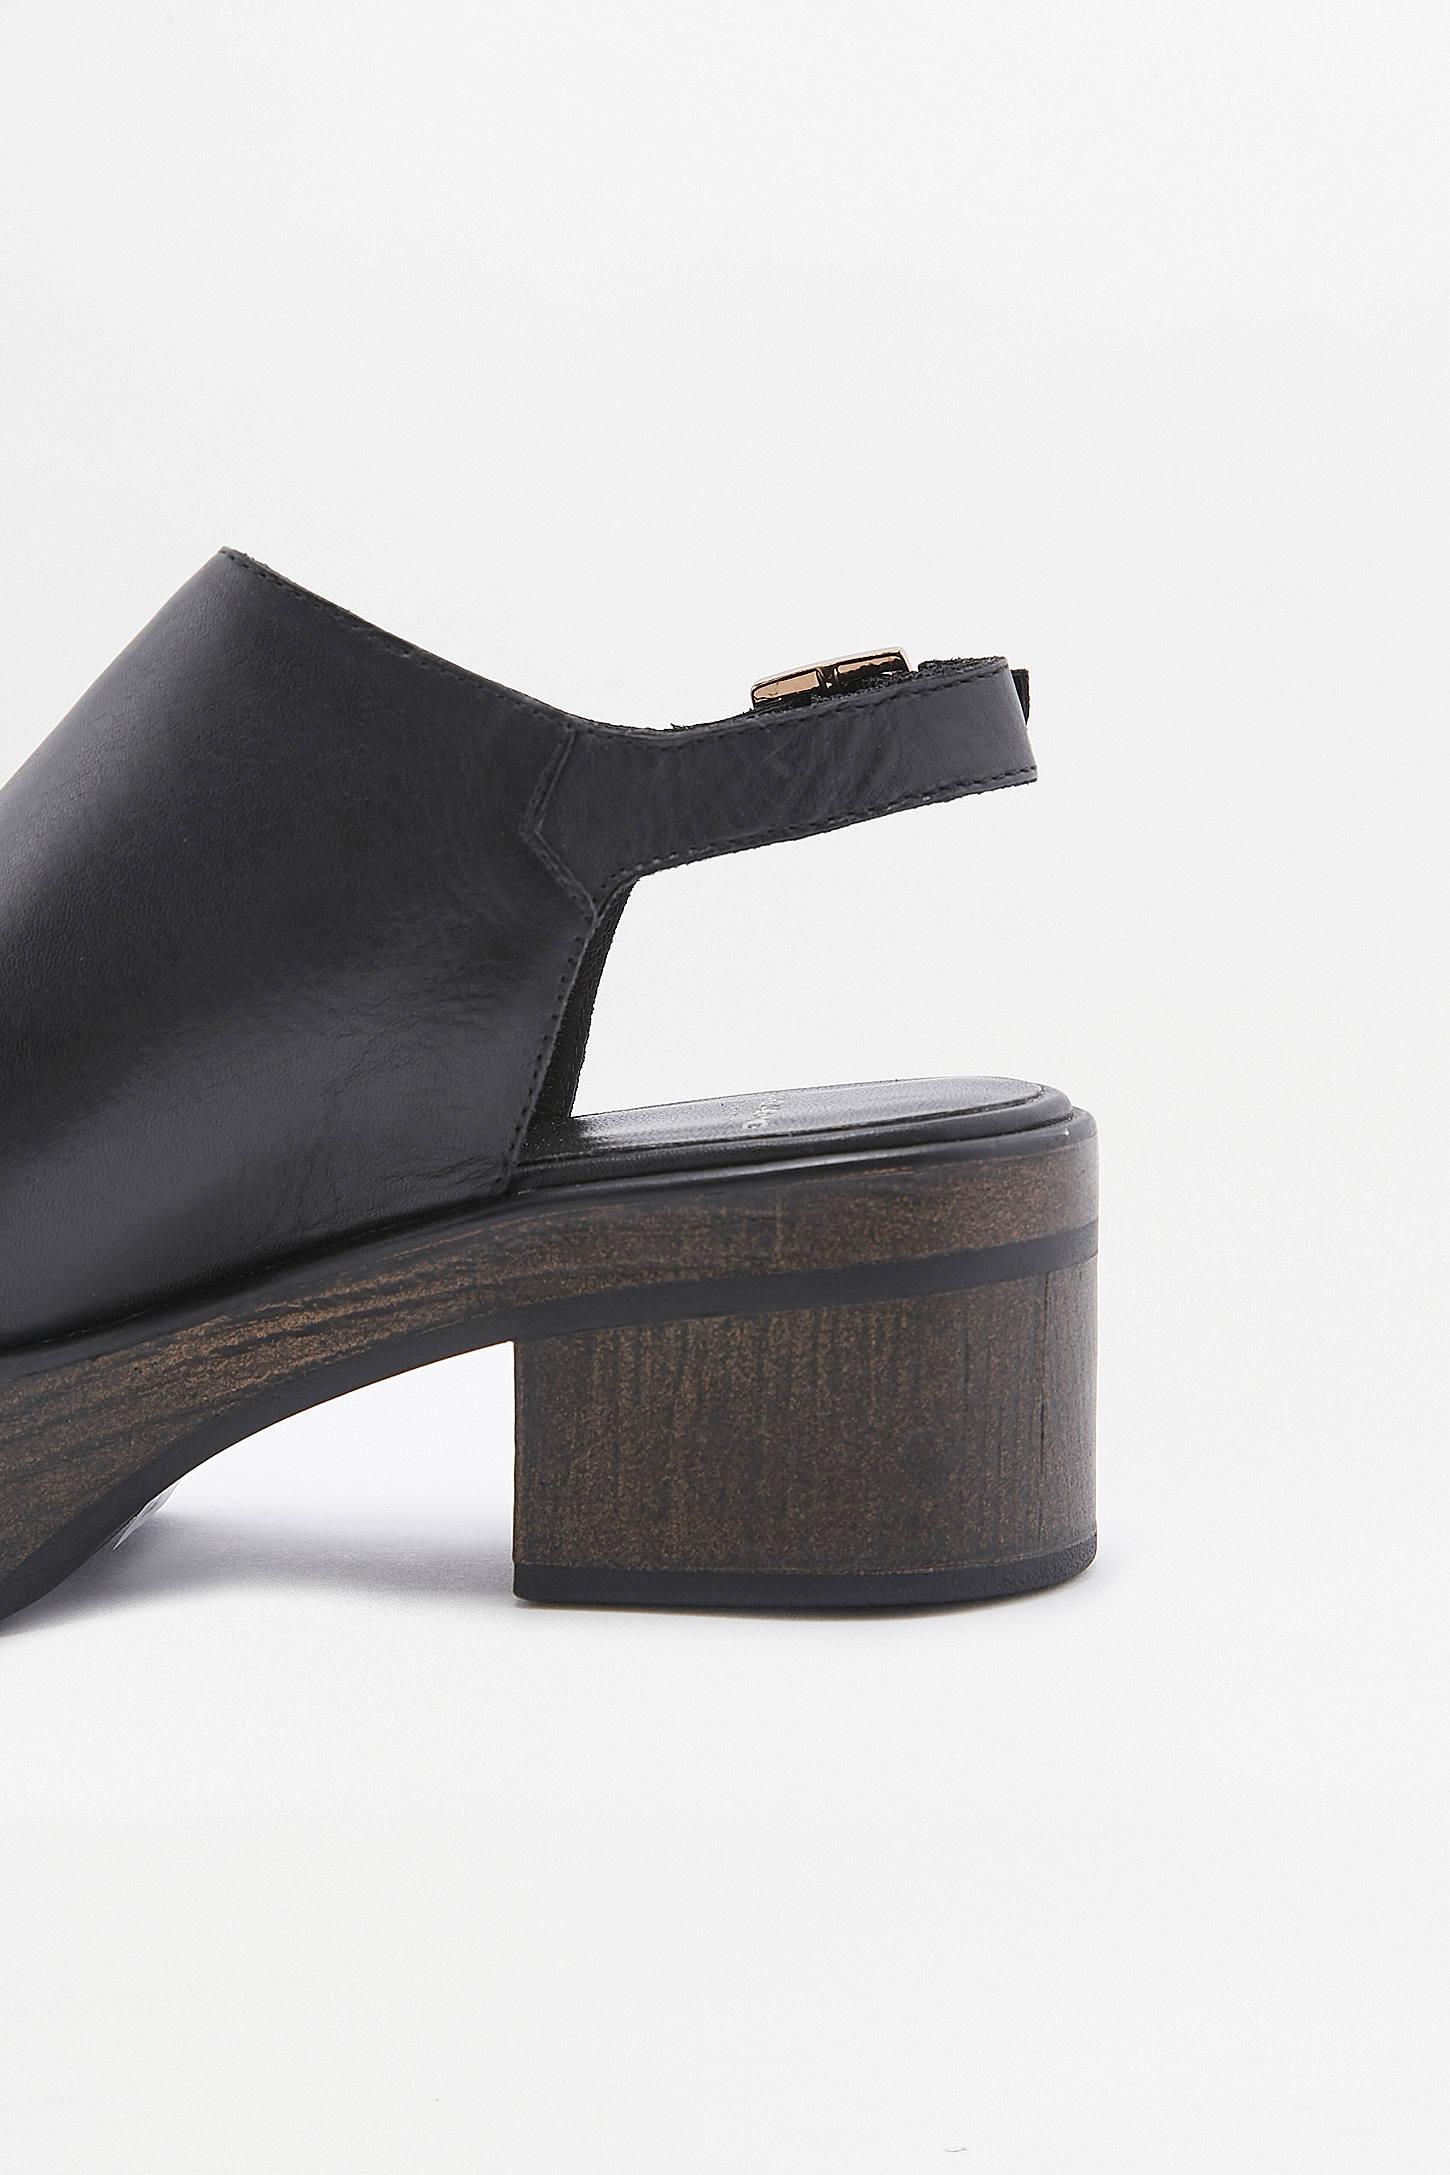 Black vagabond sandals - Slide View 4 Vagabond Noor Black Leather Platform Sandals